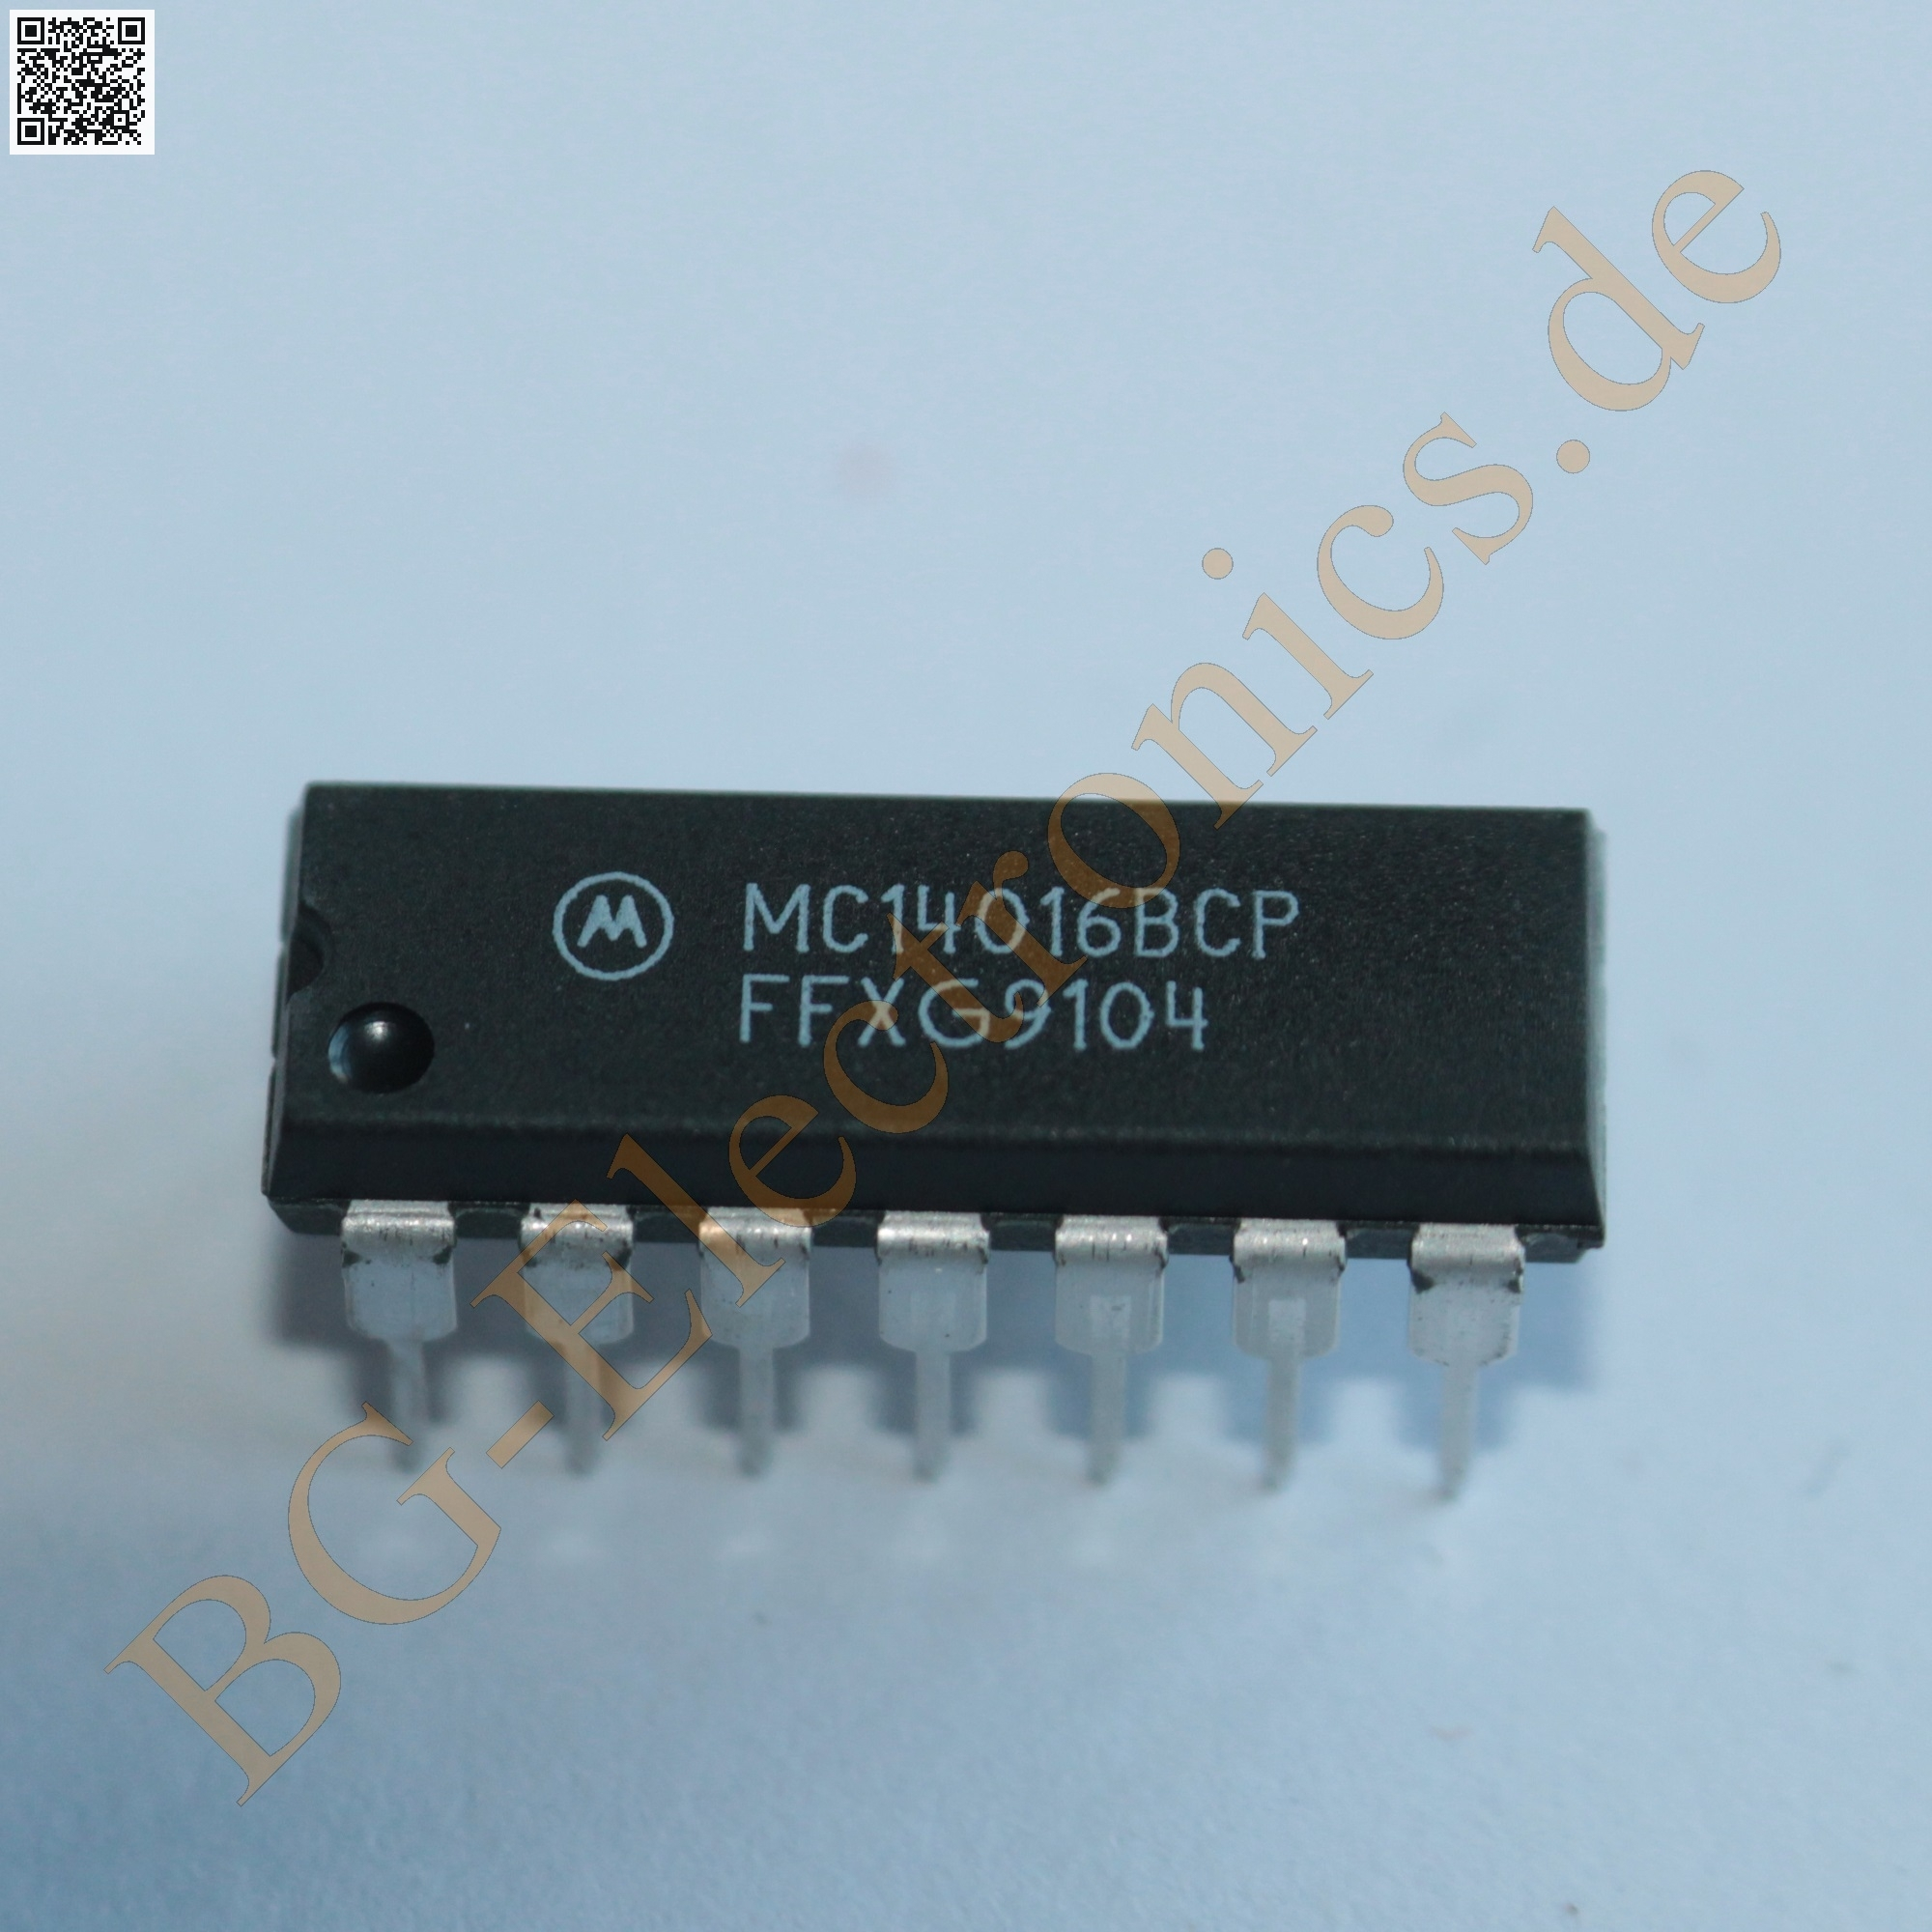 74AC240 Leitungstreiber 8-Bit-Bus DIP20